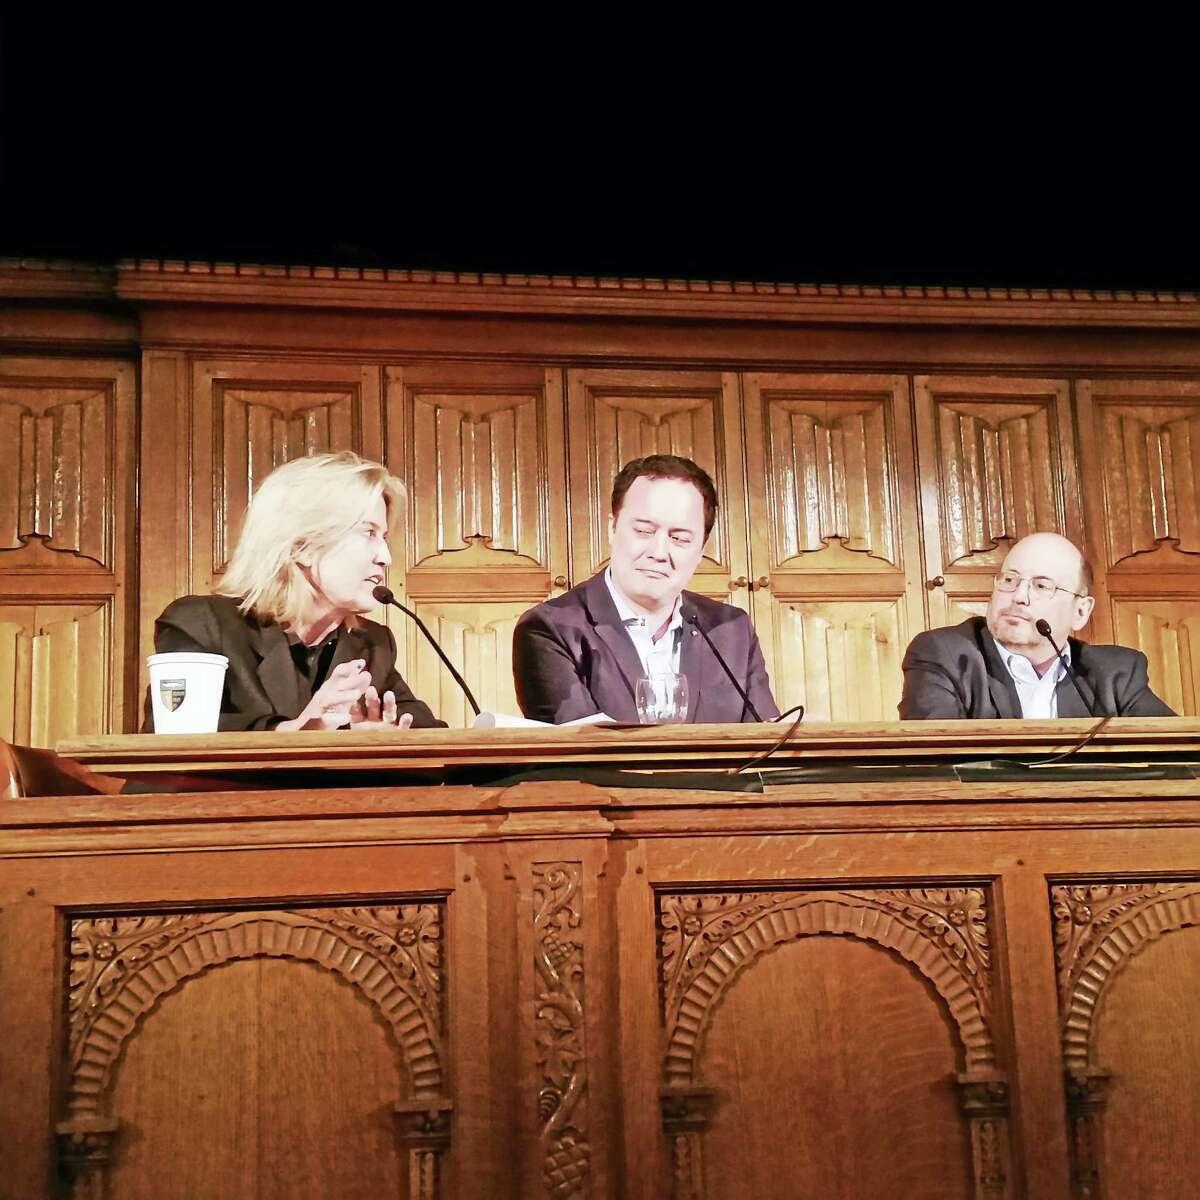 Greta Van Susteren with Graeme Wood of The Atlantic and Kurt Eichenwald of Newsweek.